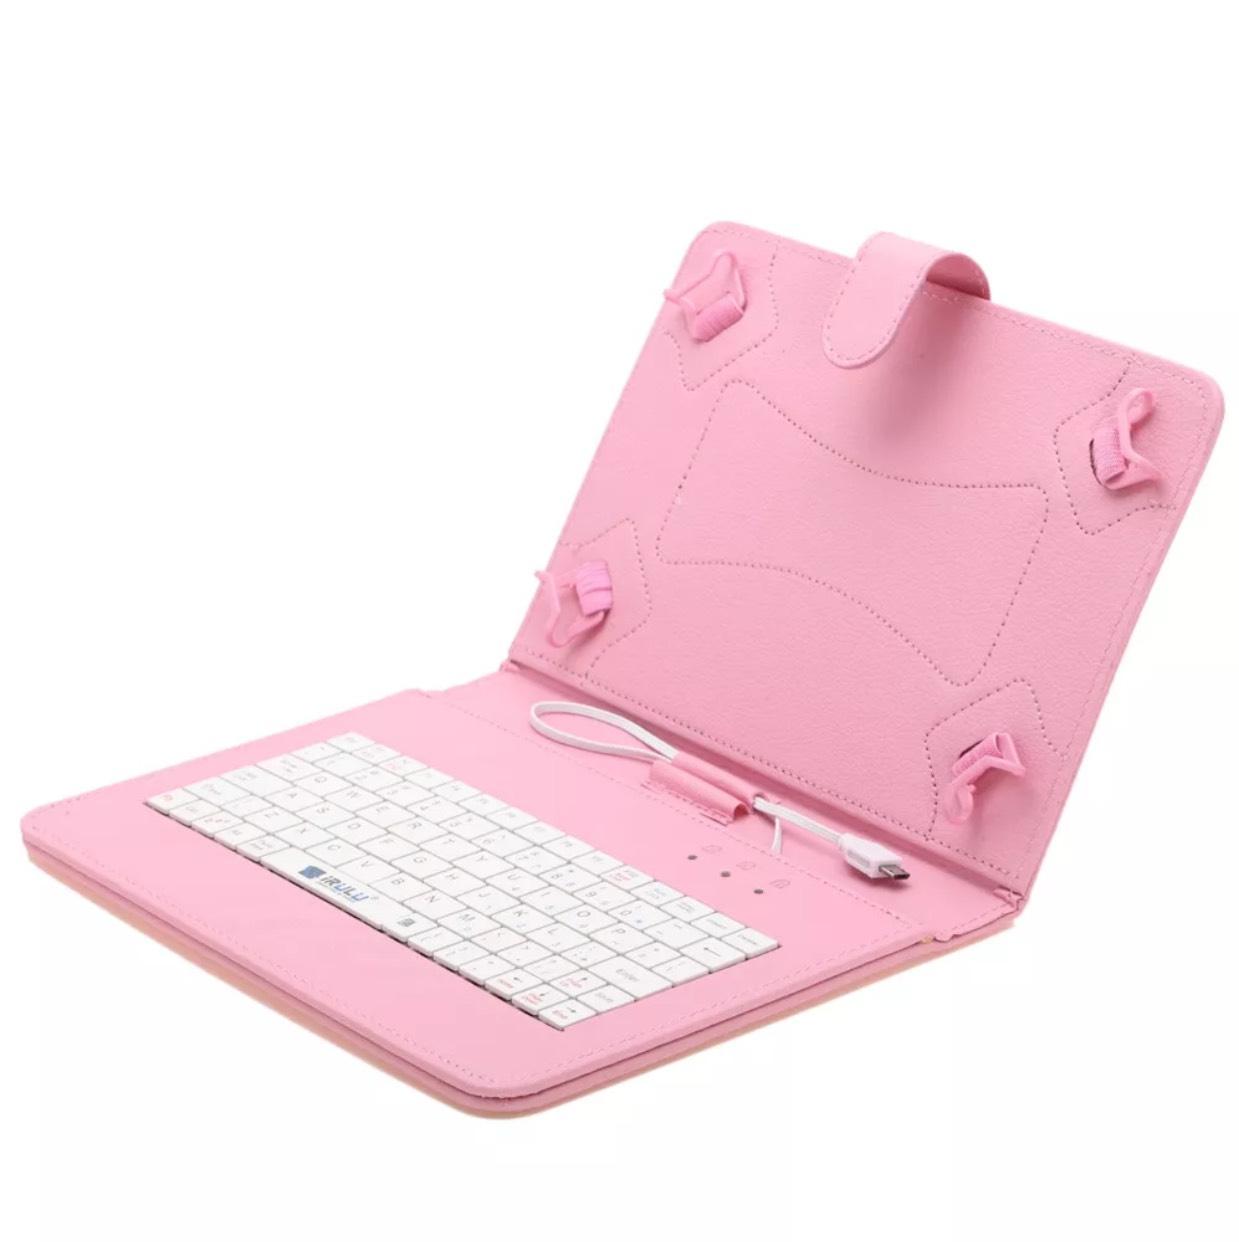 "iRulu 9"" universal micro usb keyboard case stand cover only 99p @ eBay (seller: bigbannertech)"